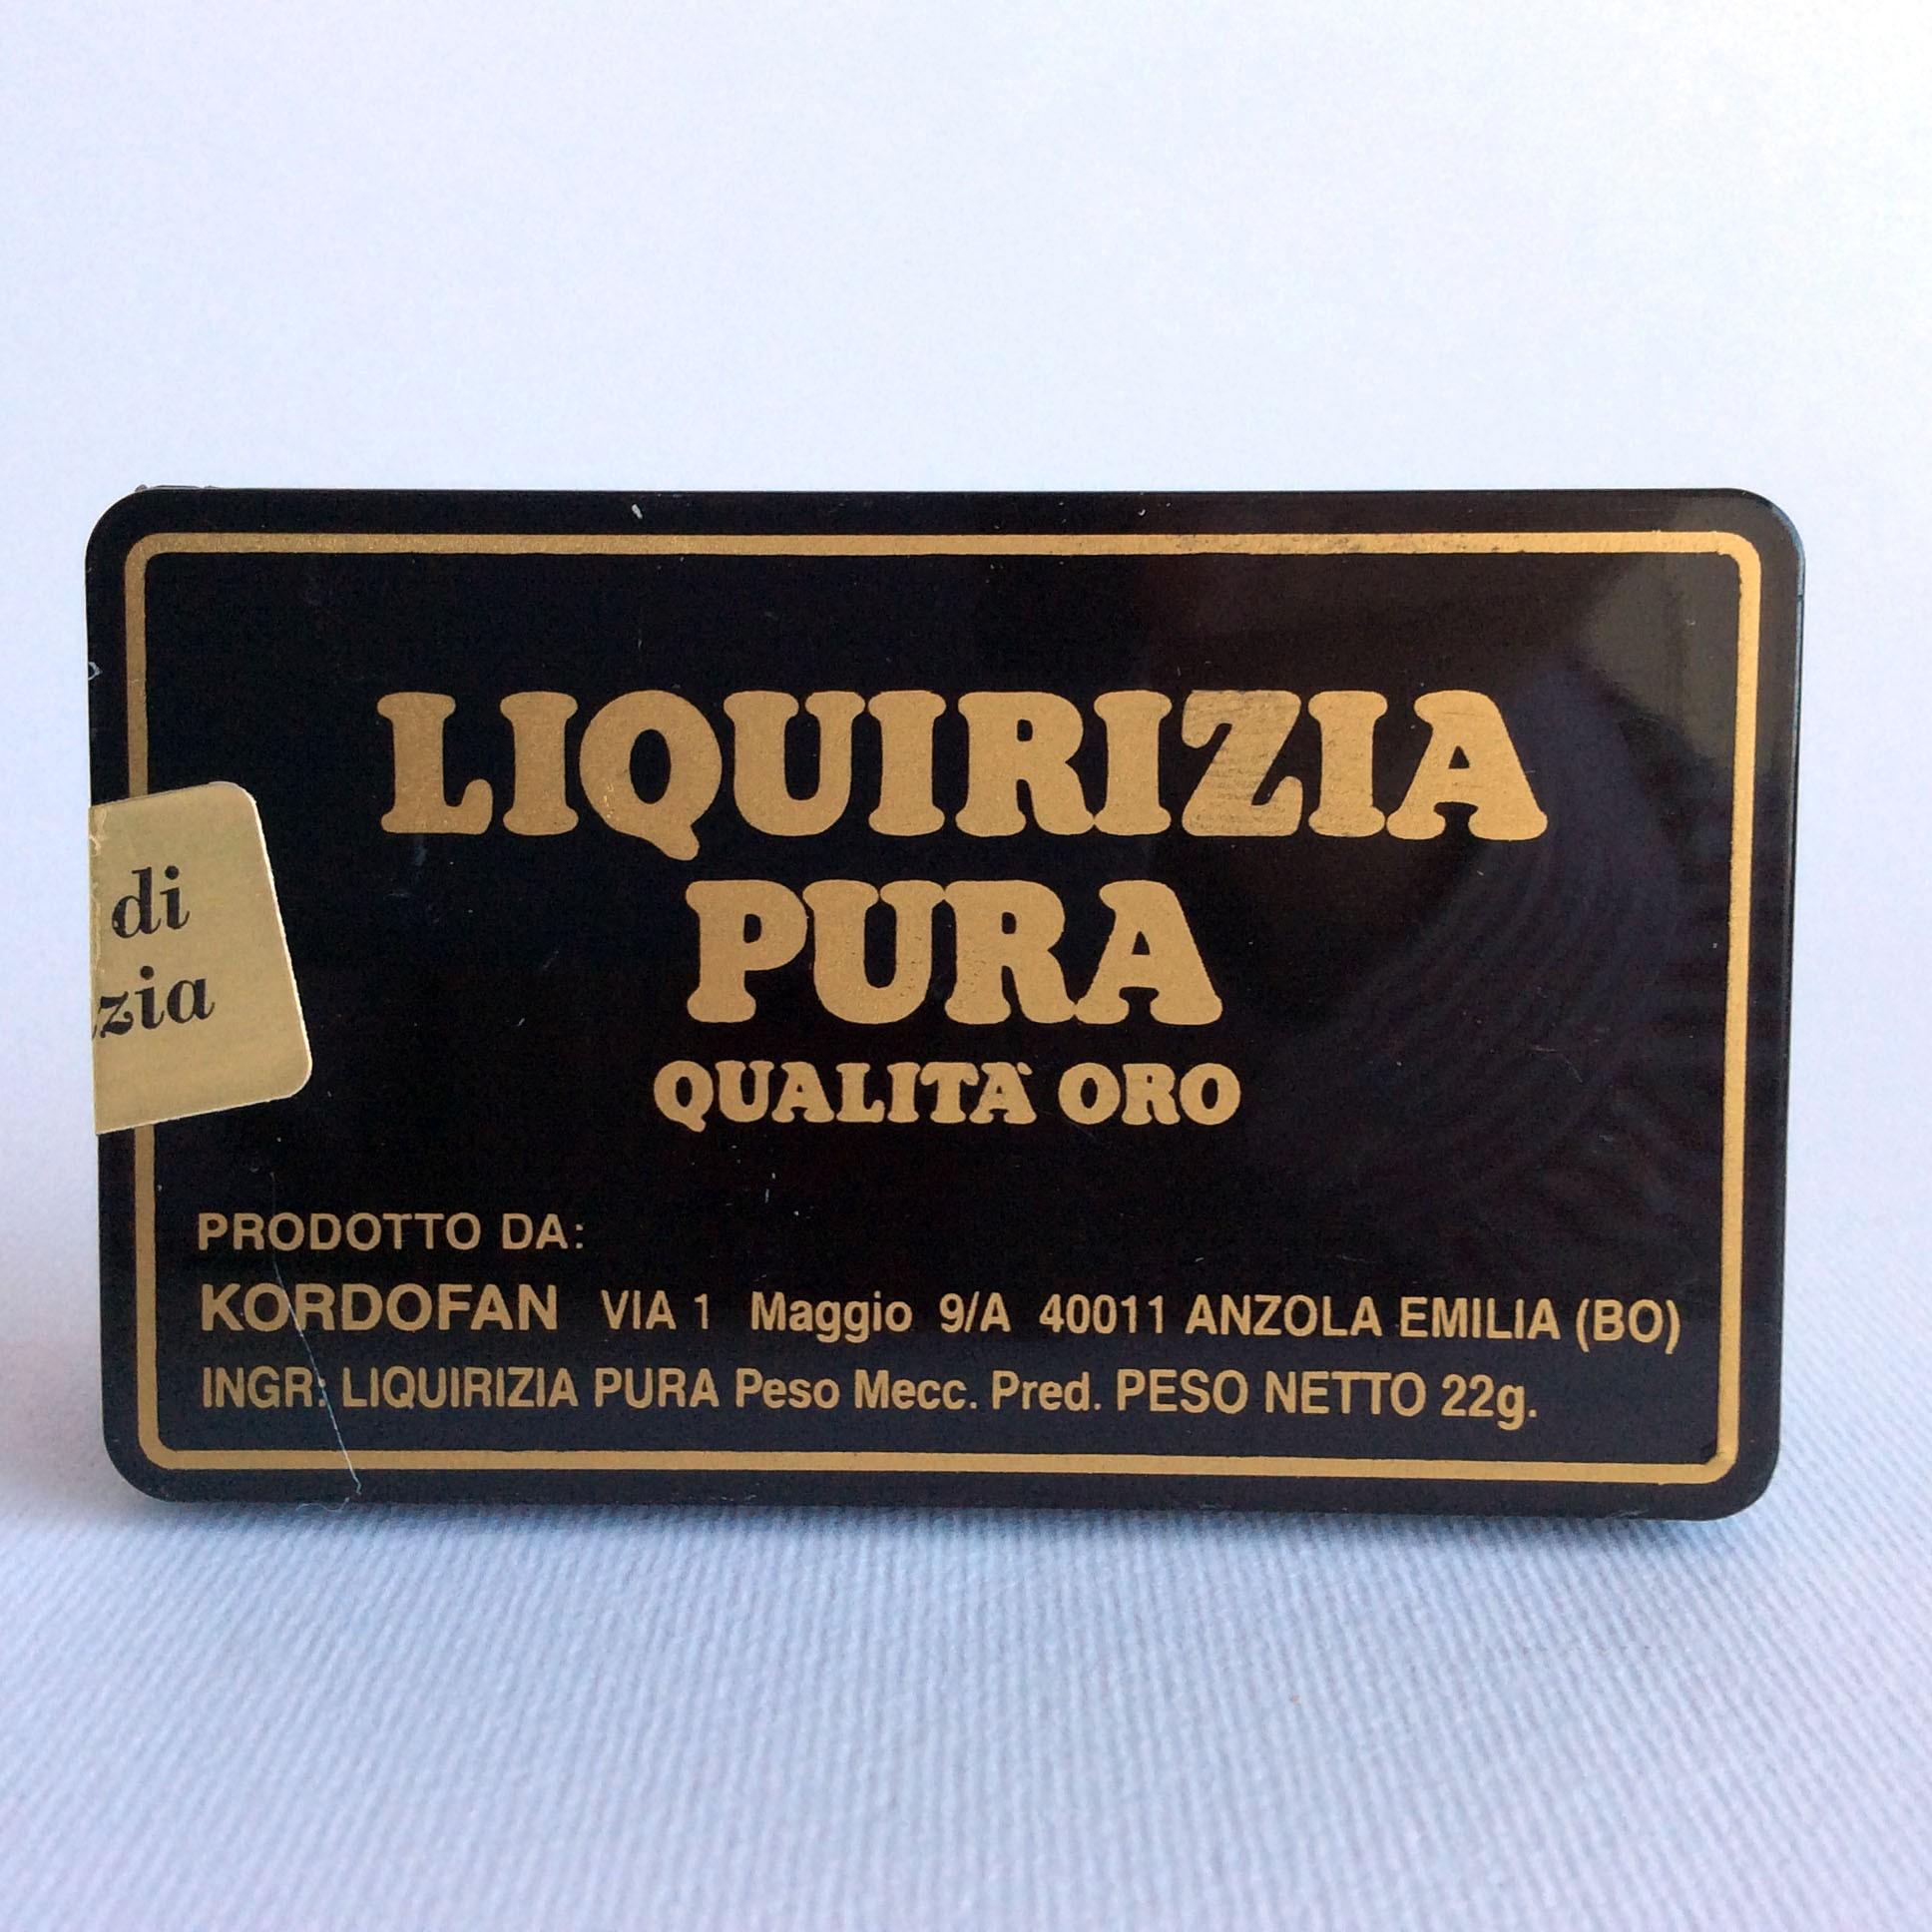 Kordofan Tronchetti Liquirizia Pura Qualita' Oro 22 Gr